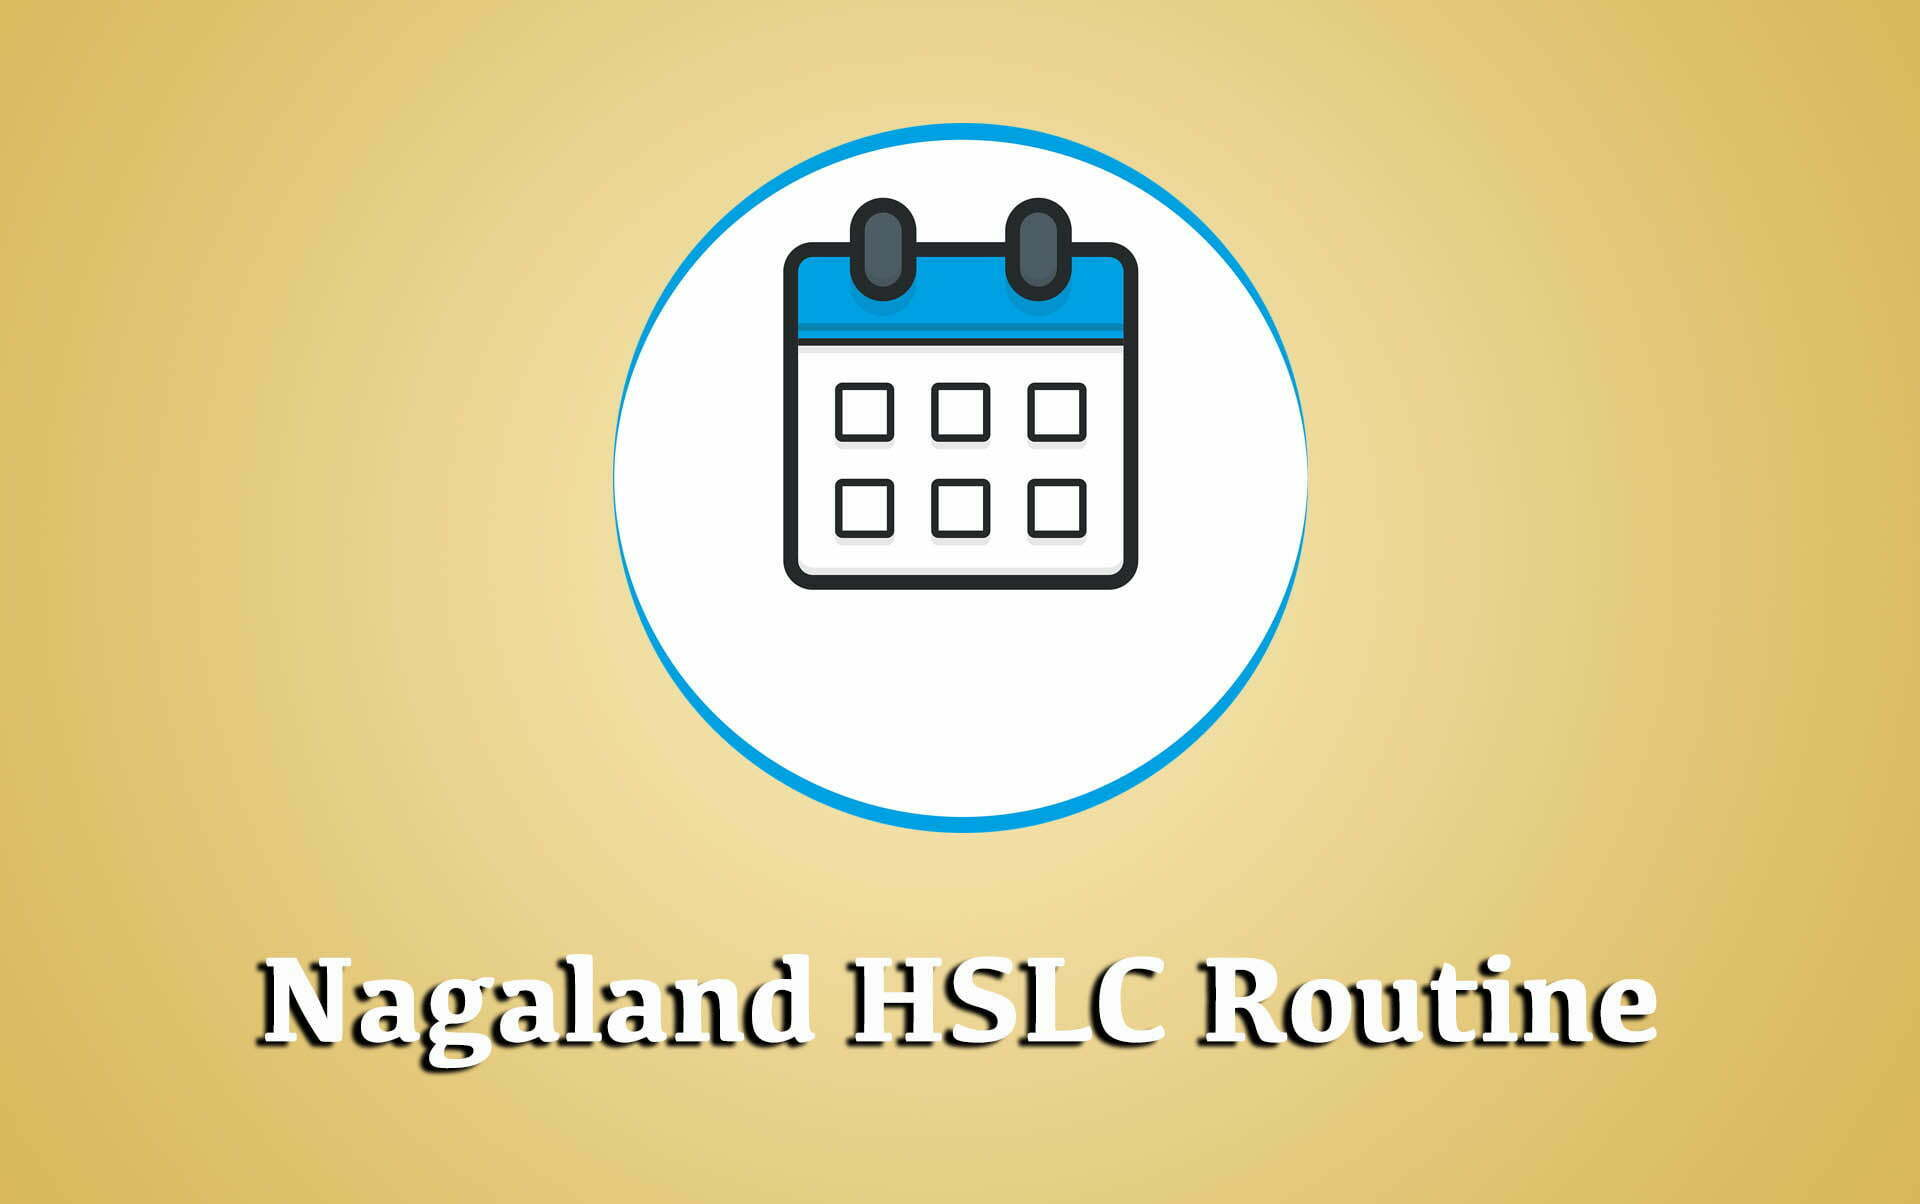 Nagaland HSSLC Routine